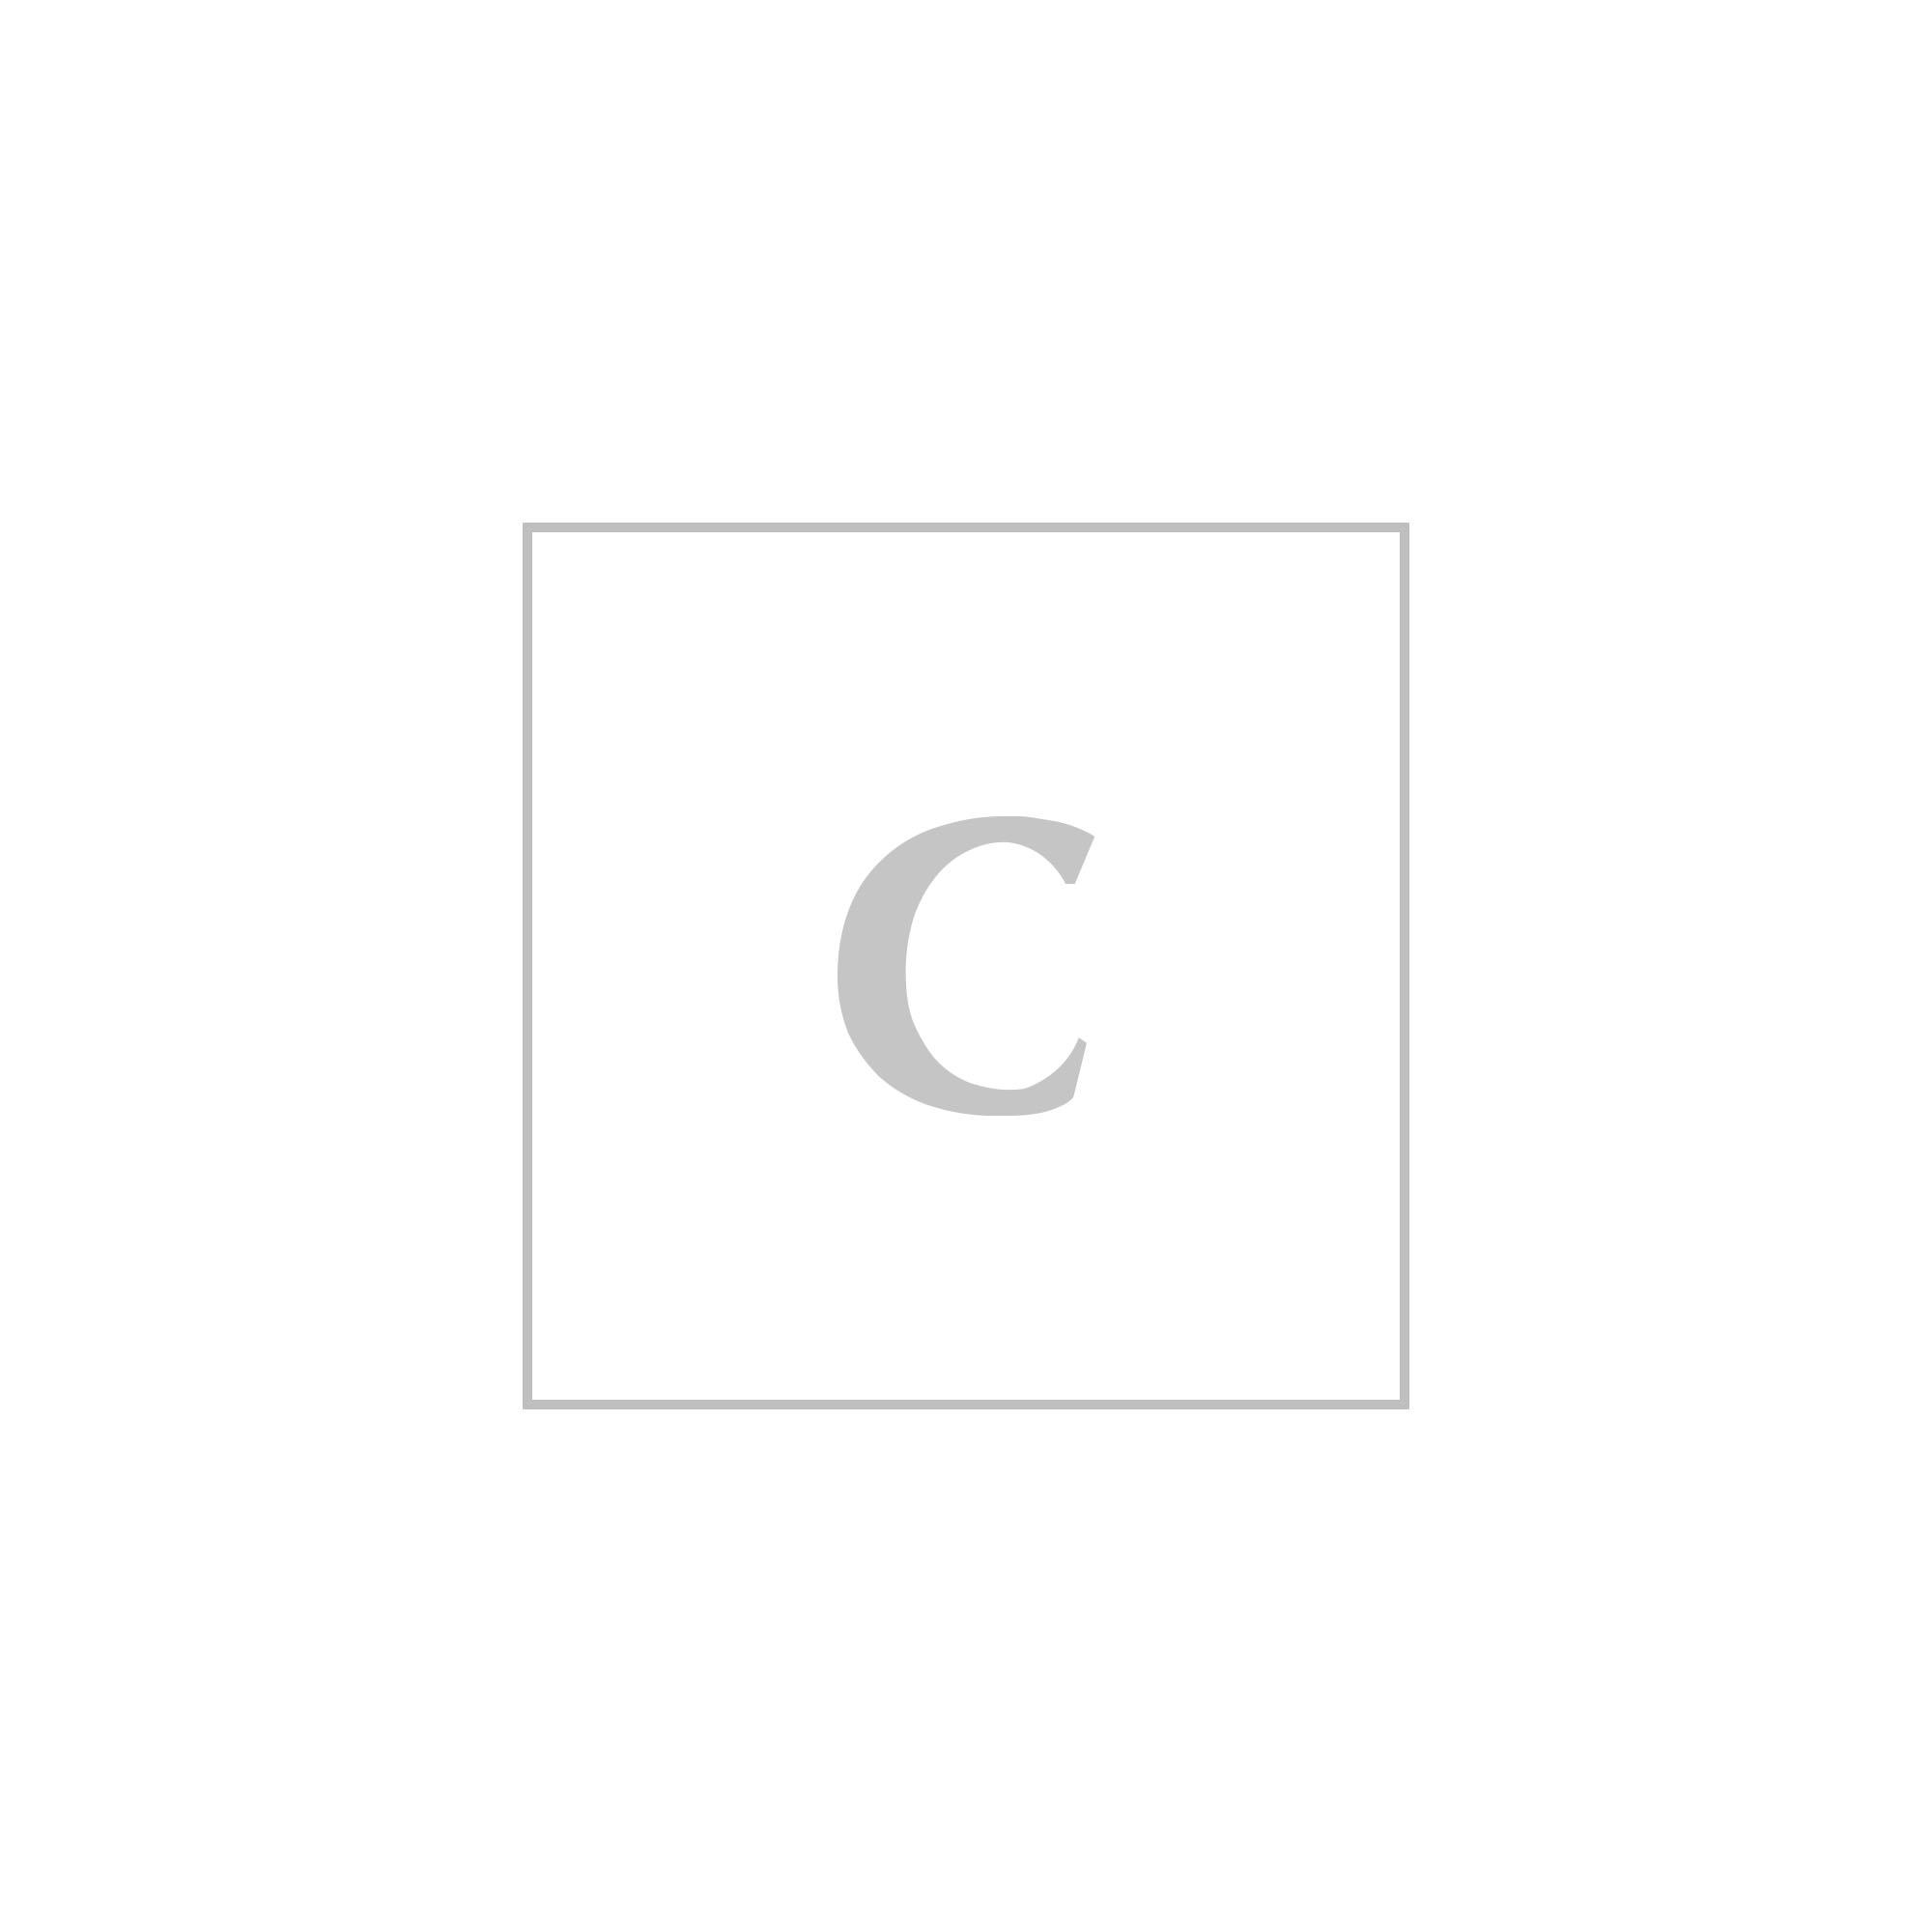 912be3dc196839 abiti j-w-anderson nero 182036dab000001-999-3.jpg